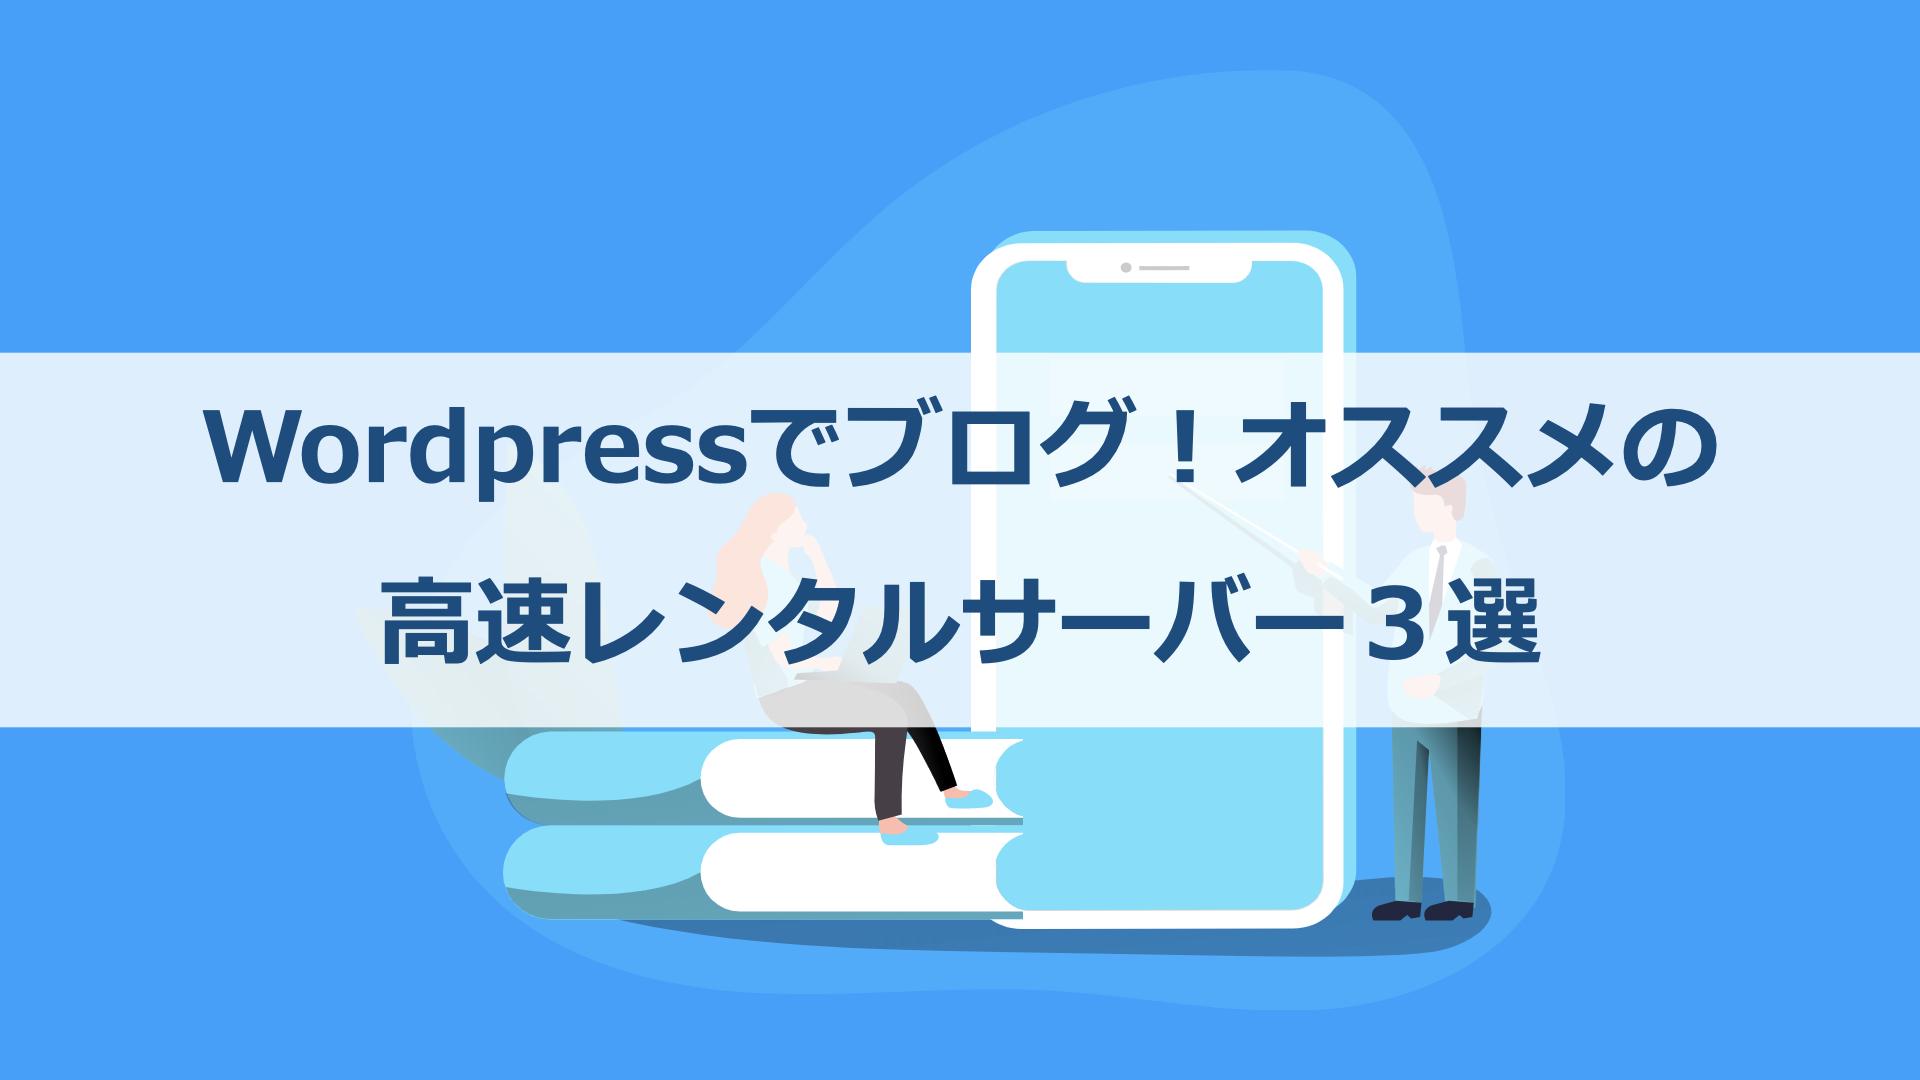 WordPressでブログ!オススメの高速レンタルサーバー3選